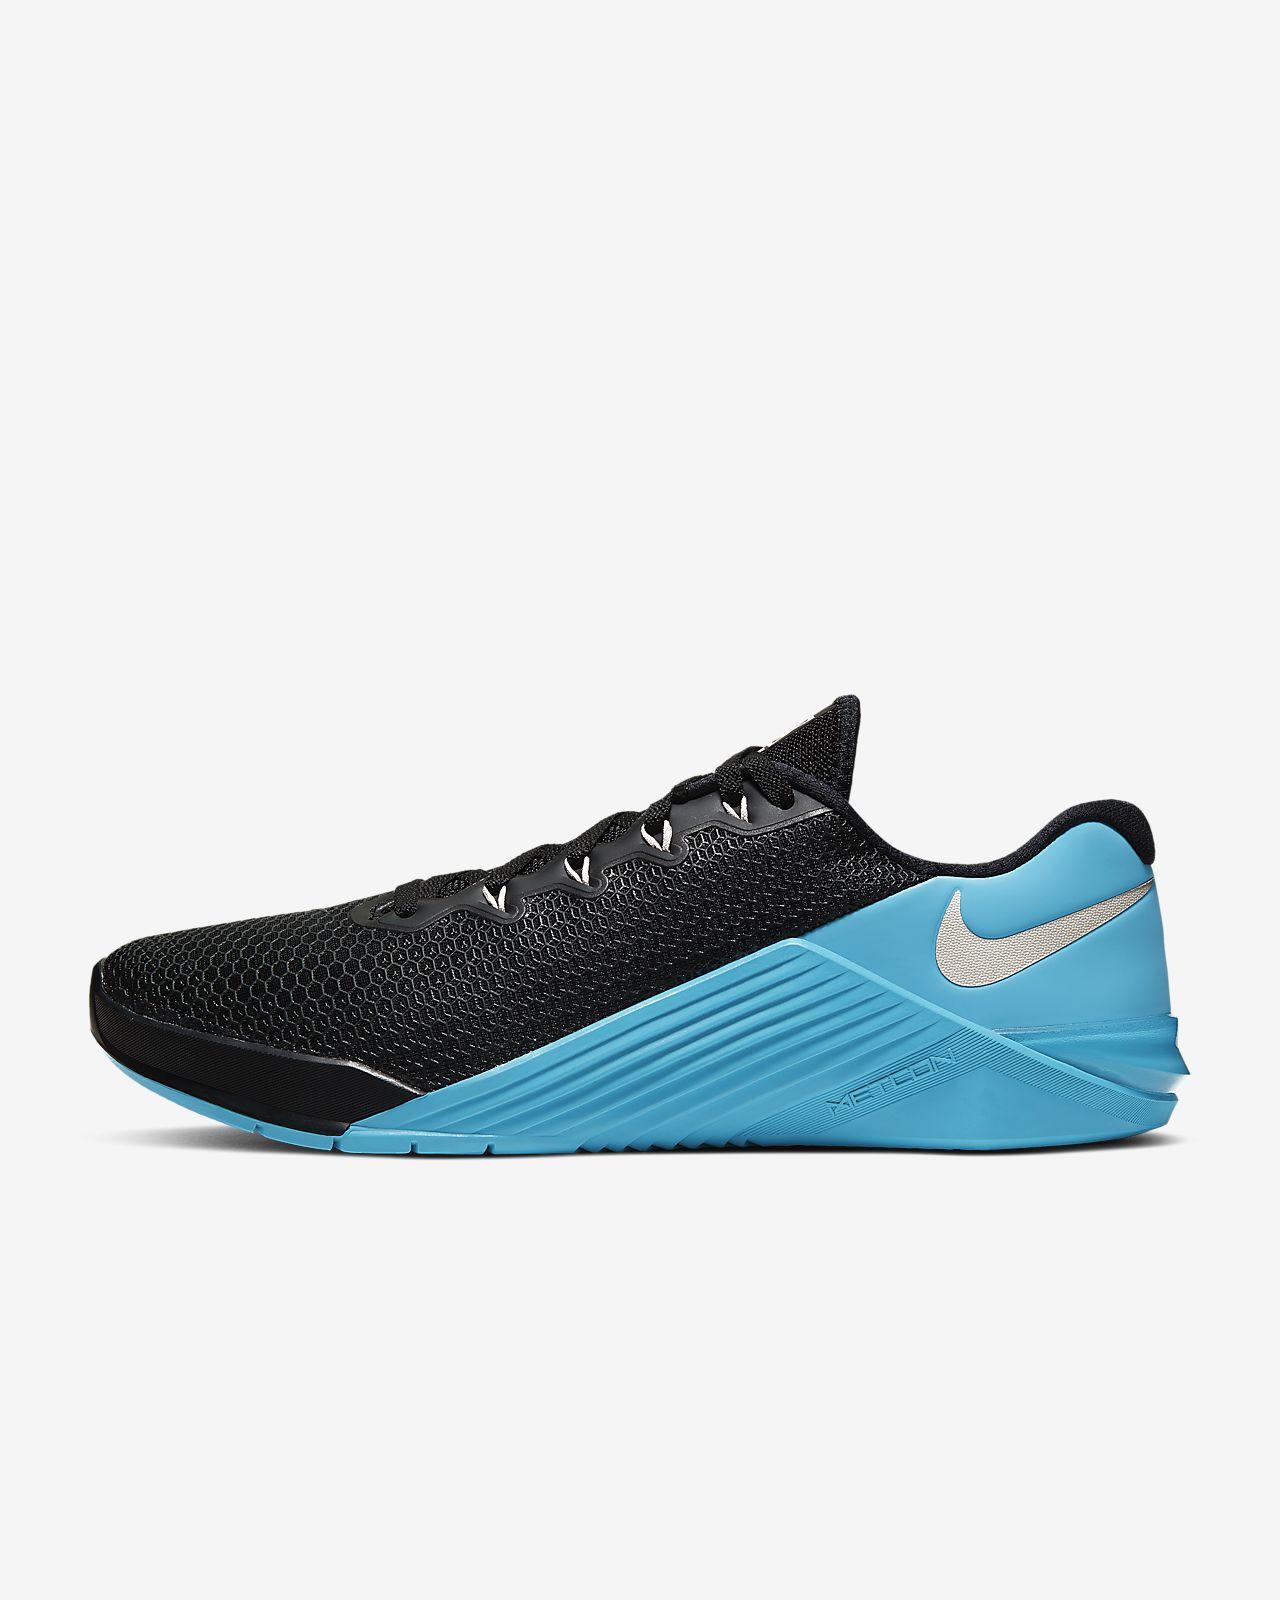 Chaussure de training Nike Metcon 5